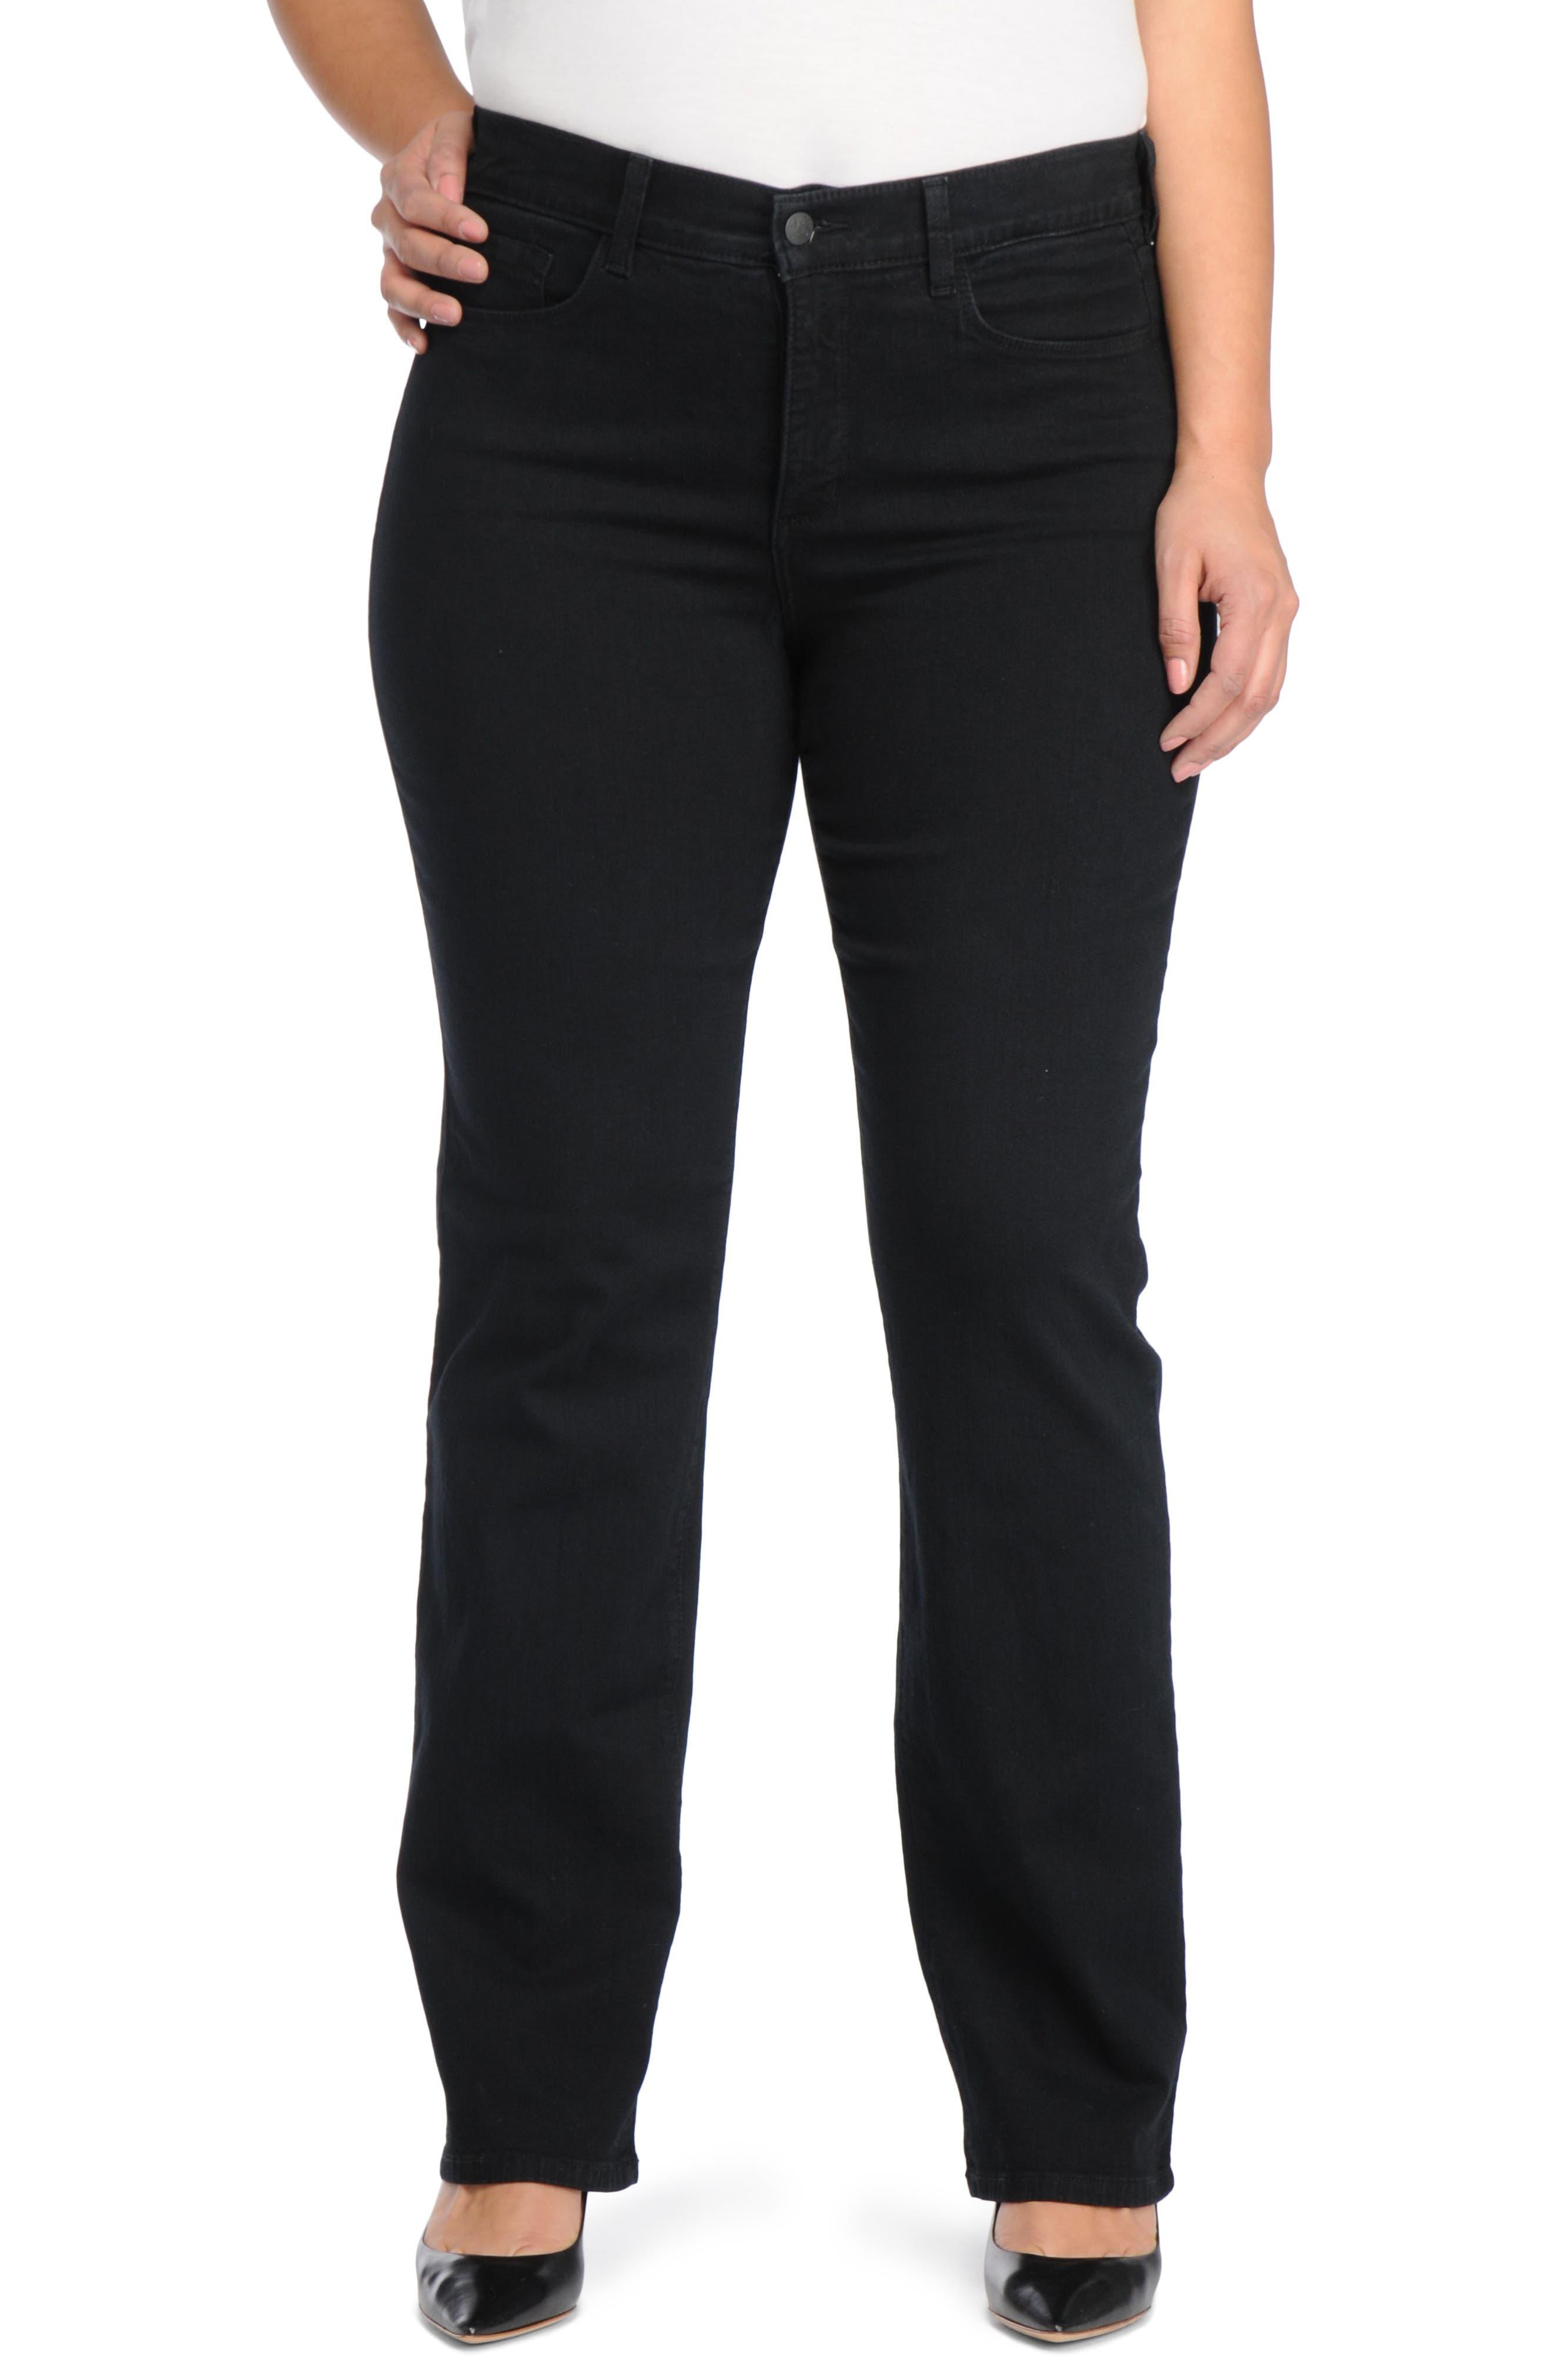 Main Image - NYDJ Marilyn Stretch Straight Leg Jeans (Plus Size)